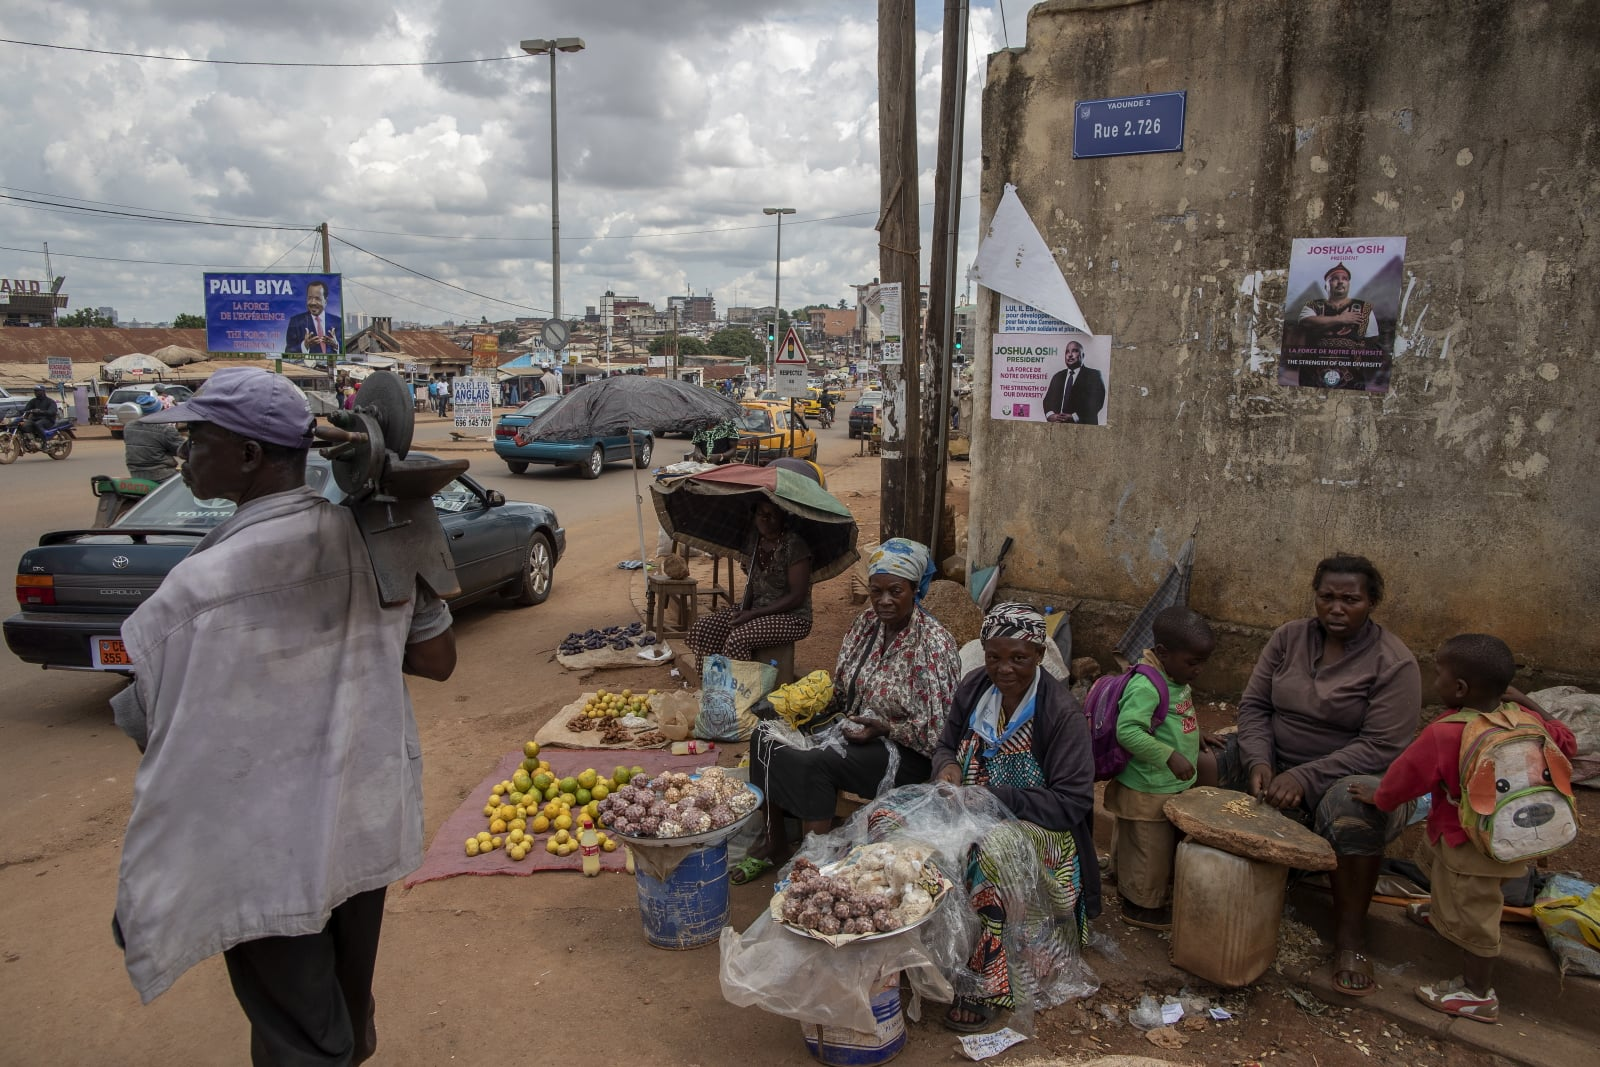 Kamerun fot. EPA/NIC BOTHMA